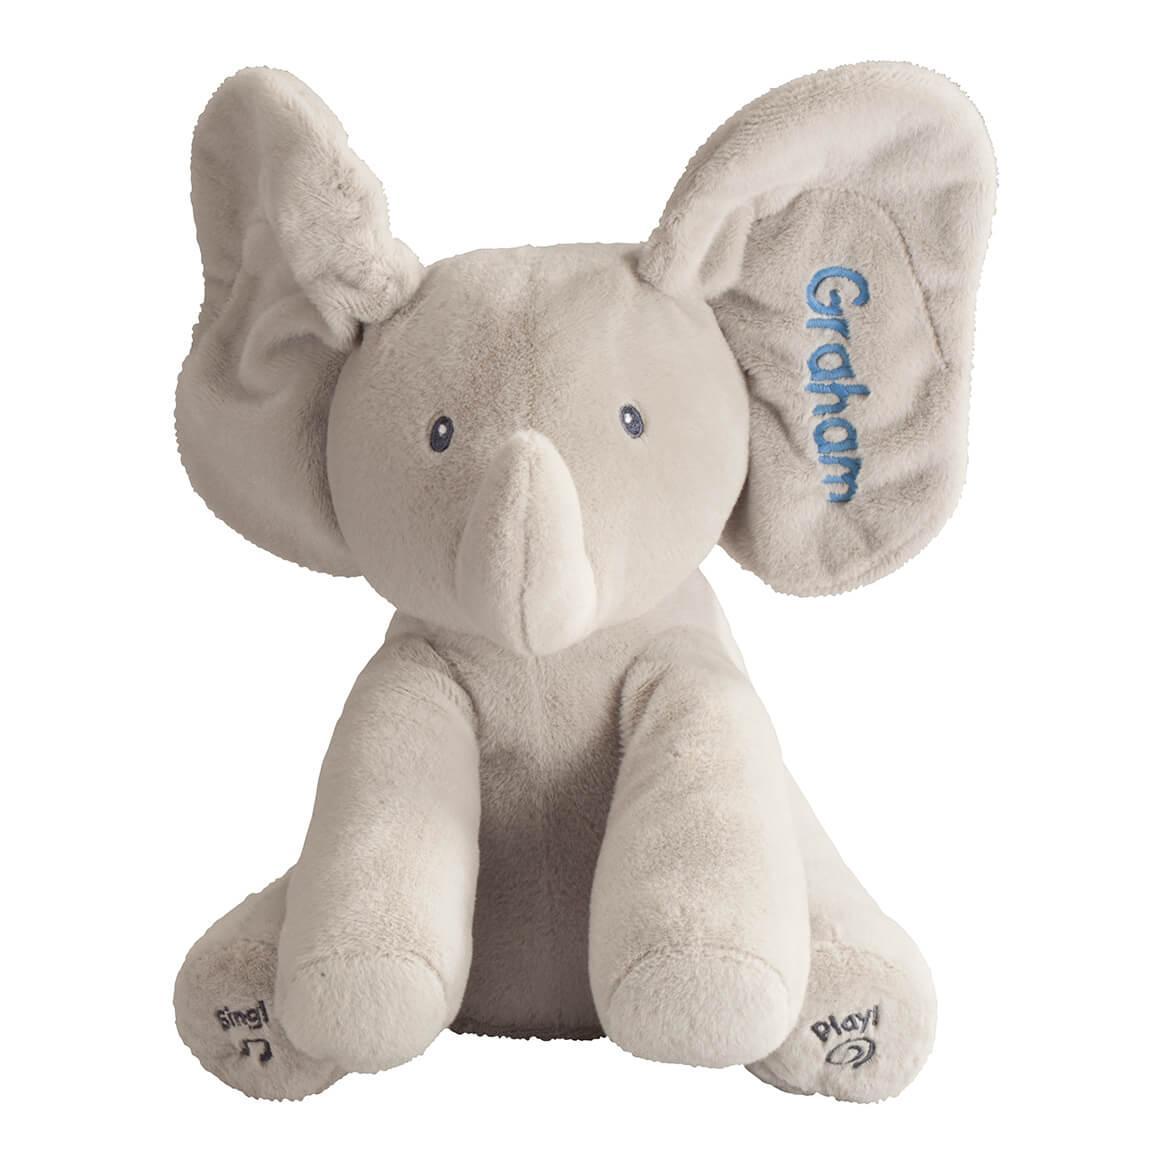 Personalized Flappy Singing Elephant